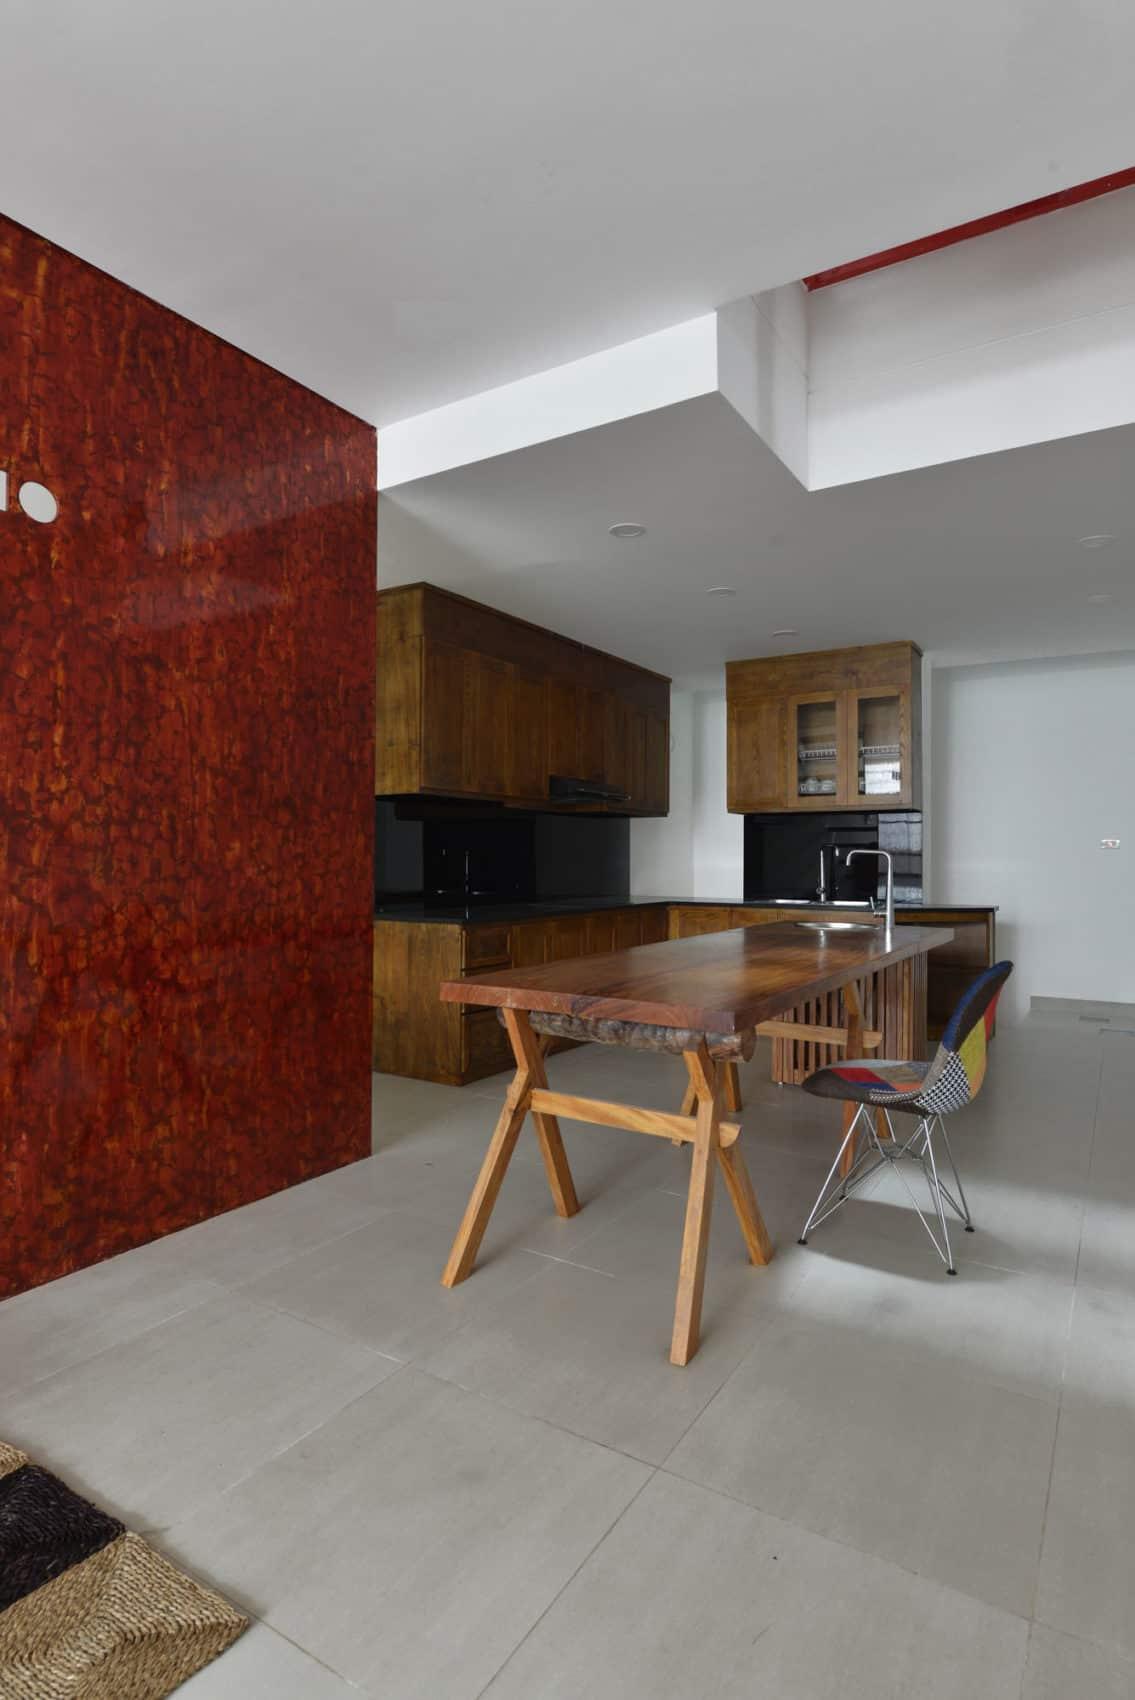 Narrow TT House in Hanoi by Adrei Studio Architecture (11)